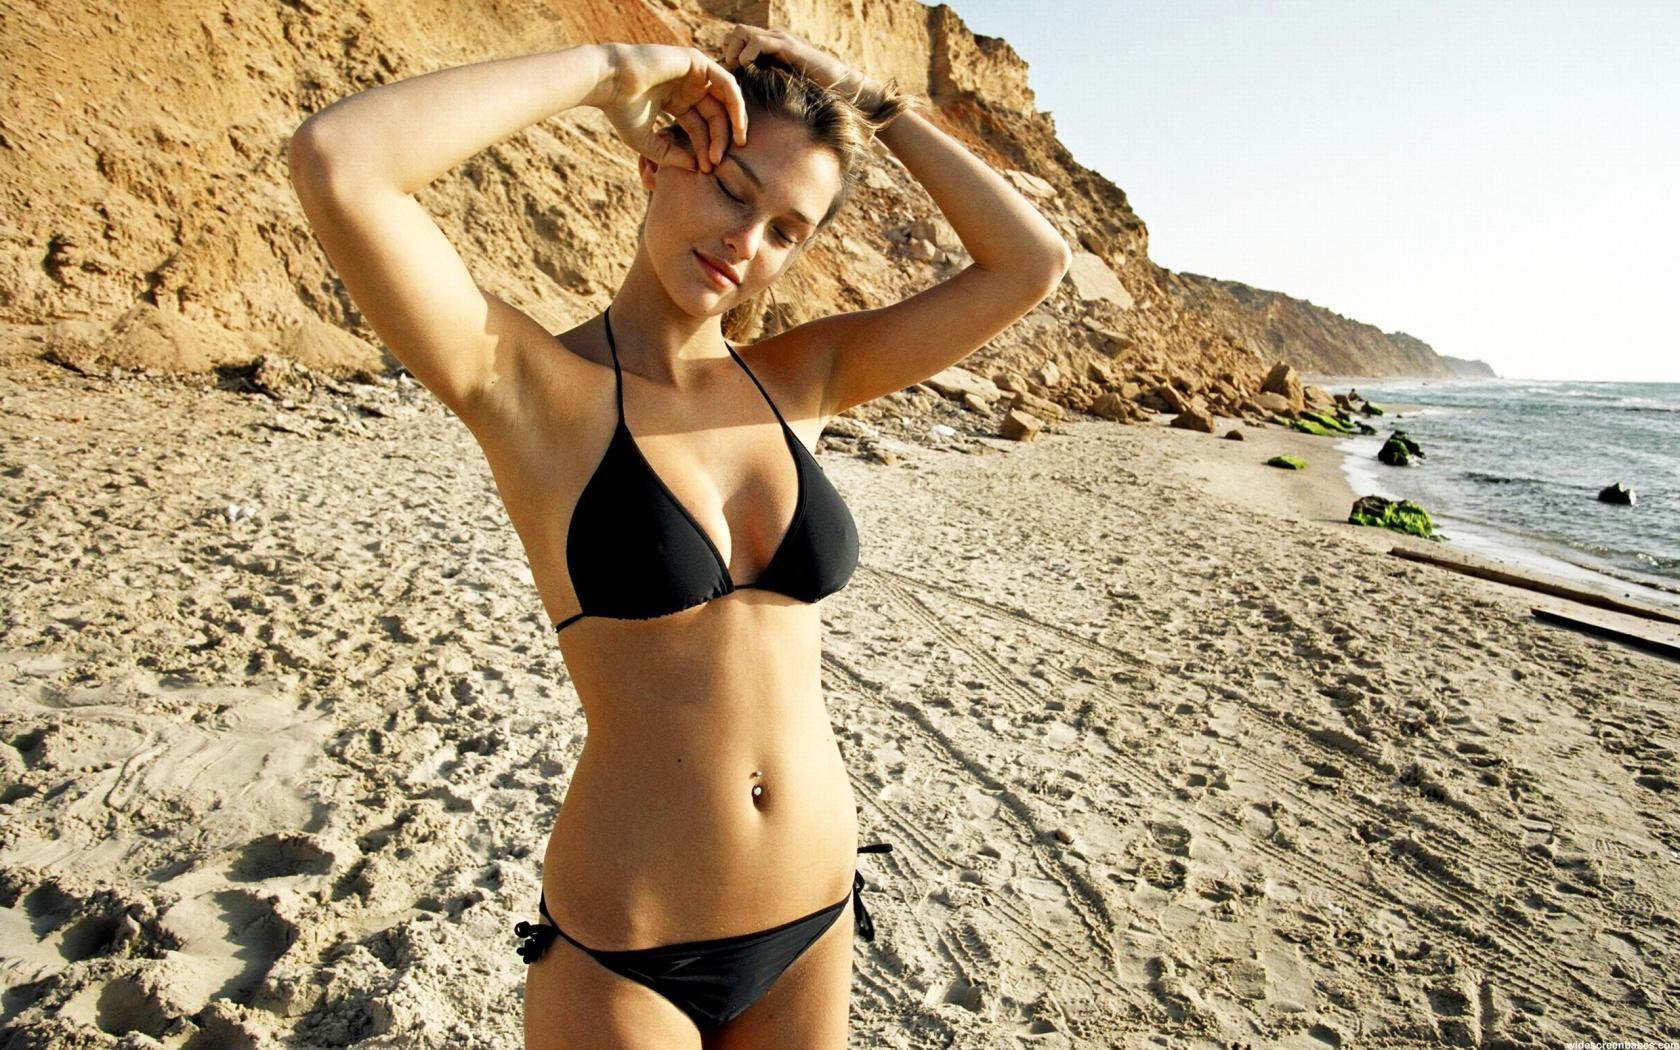 wallpaper : women, model, sand, photography, swimwear, clothing